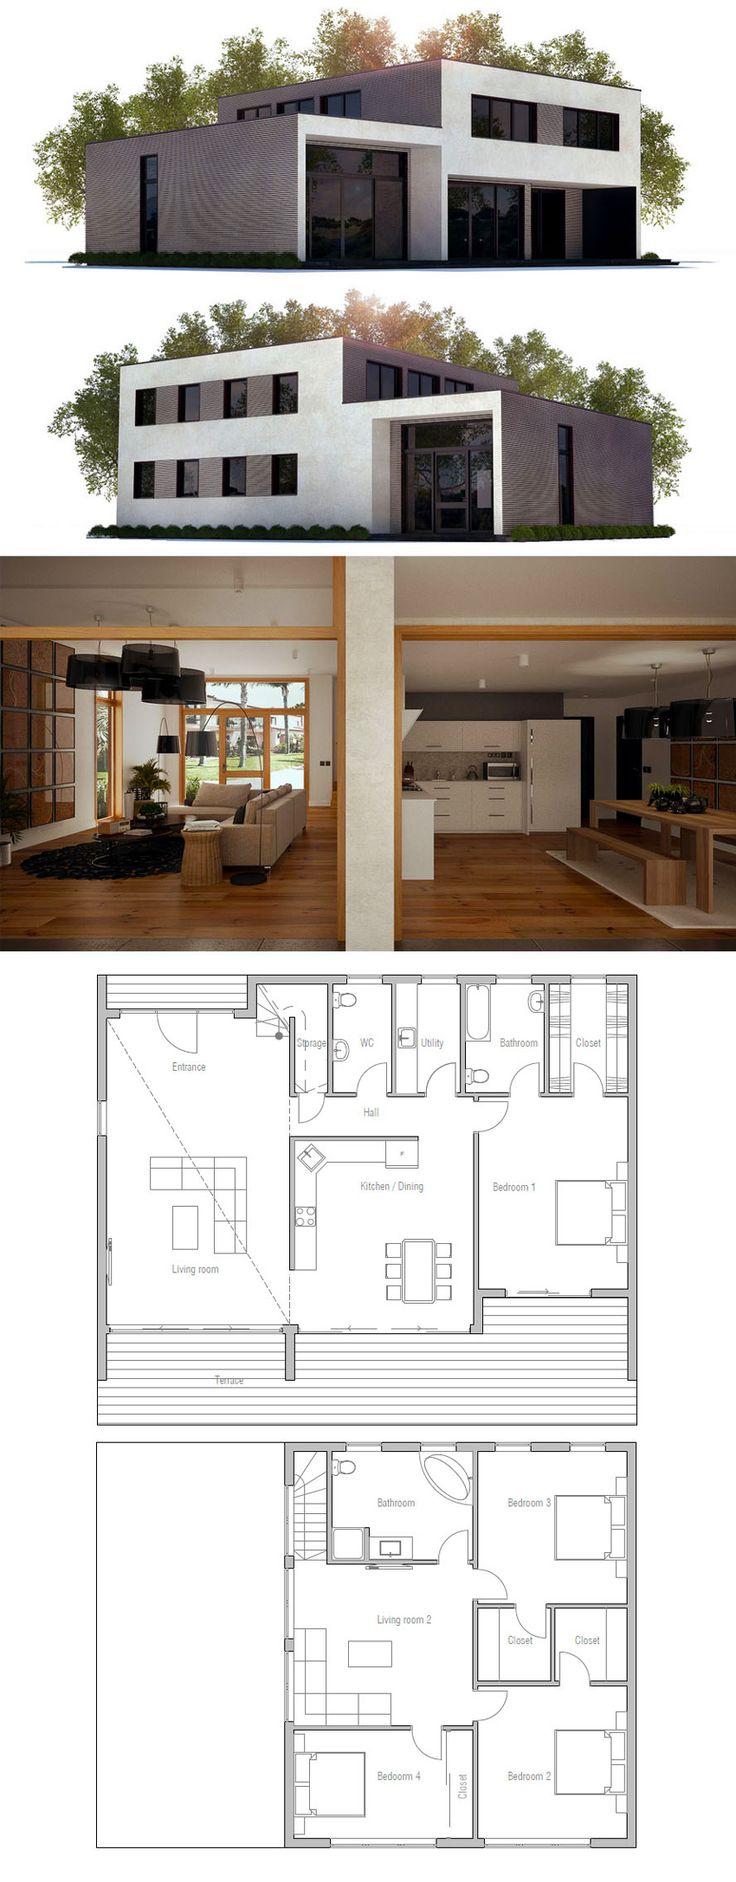 Simple Floor Plans For Houses Simple Floor Plans Open House Beach House Floor Plan